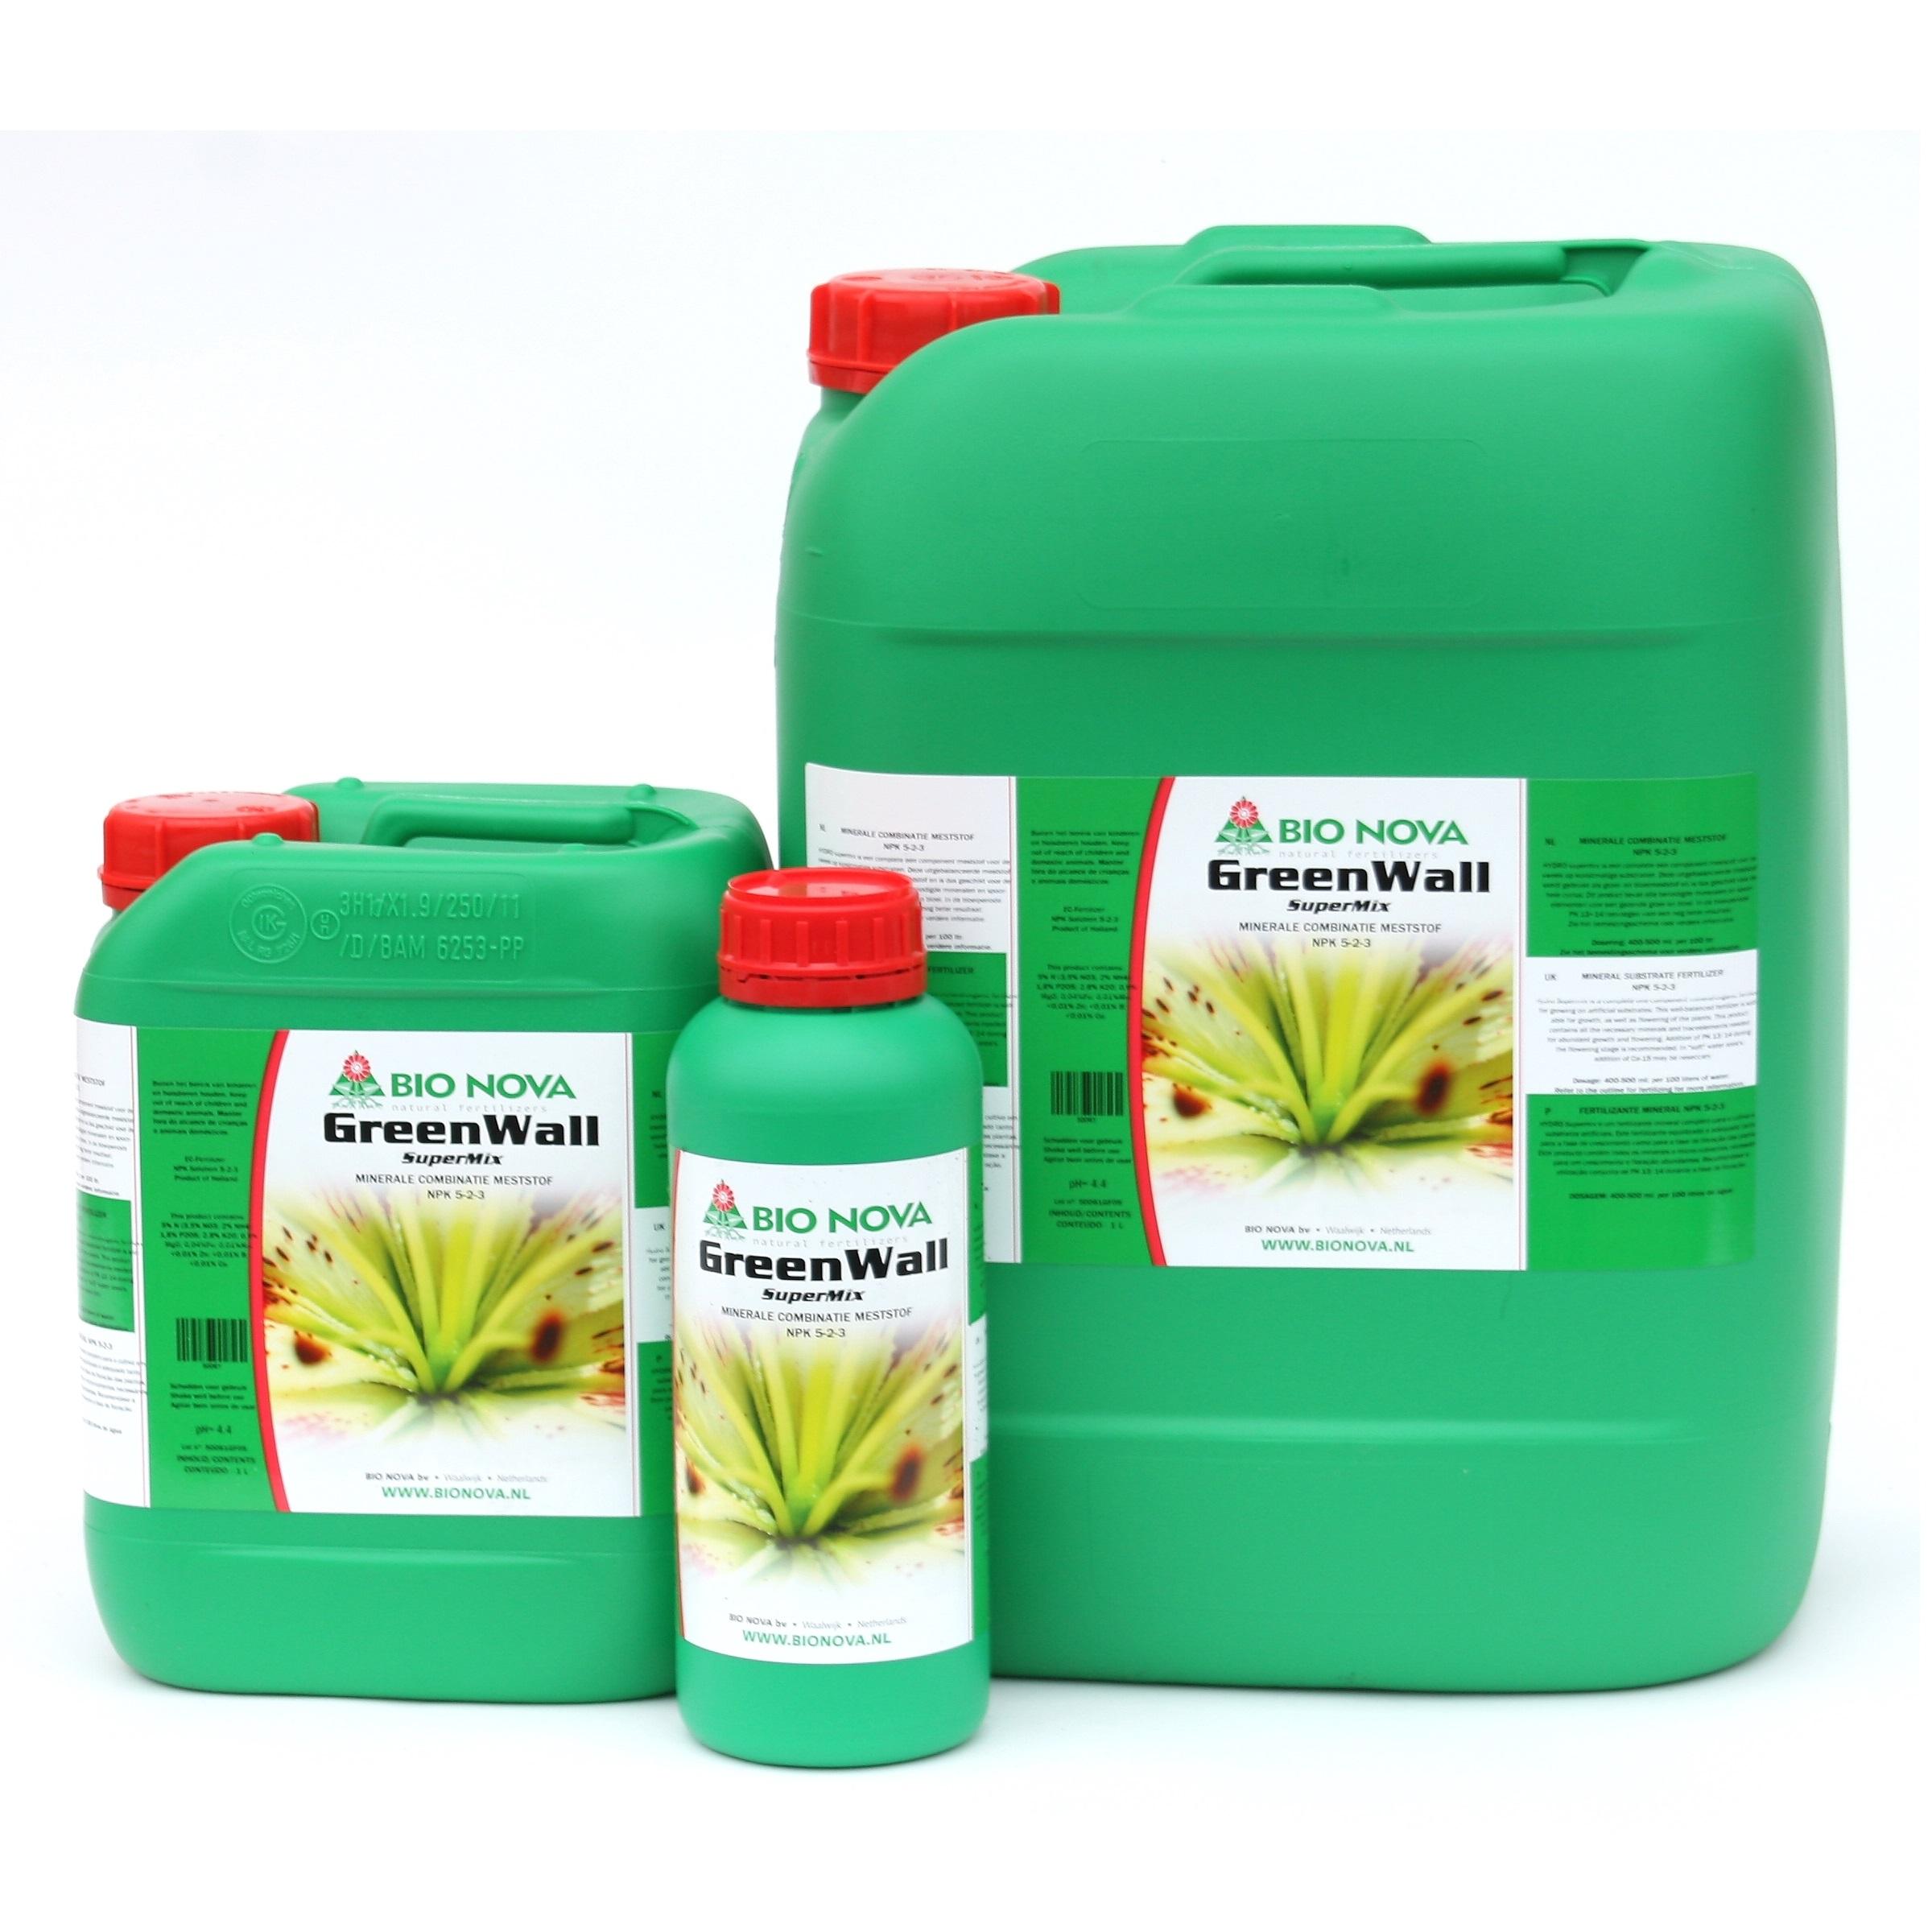 Bio Nova BN GreenWall SuperMix 5 Liter